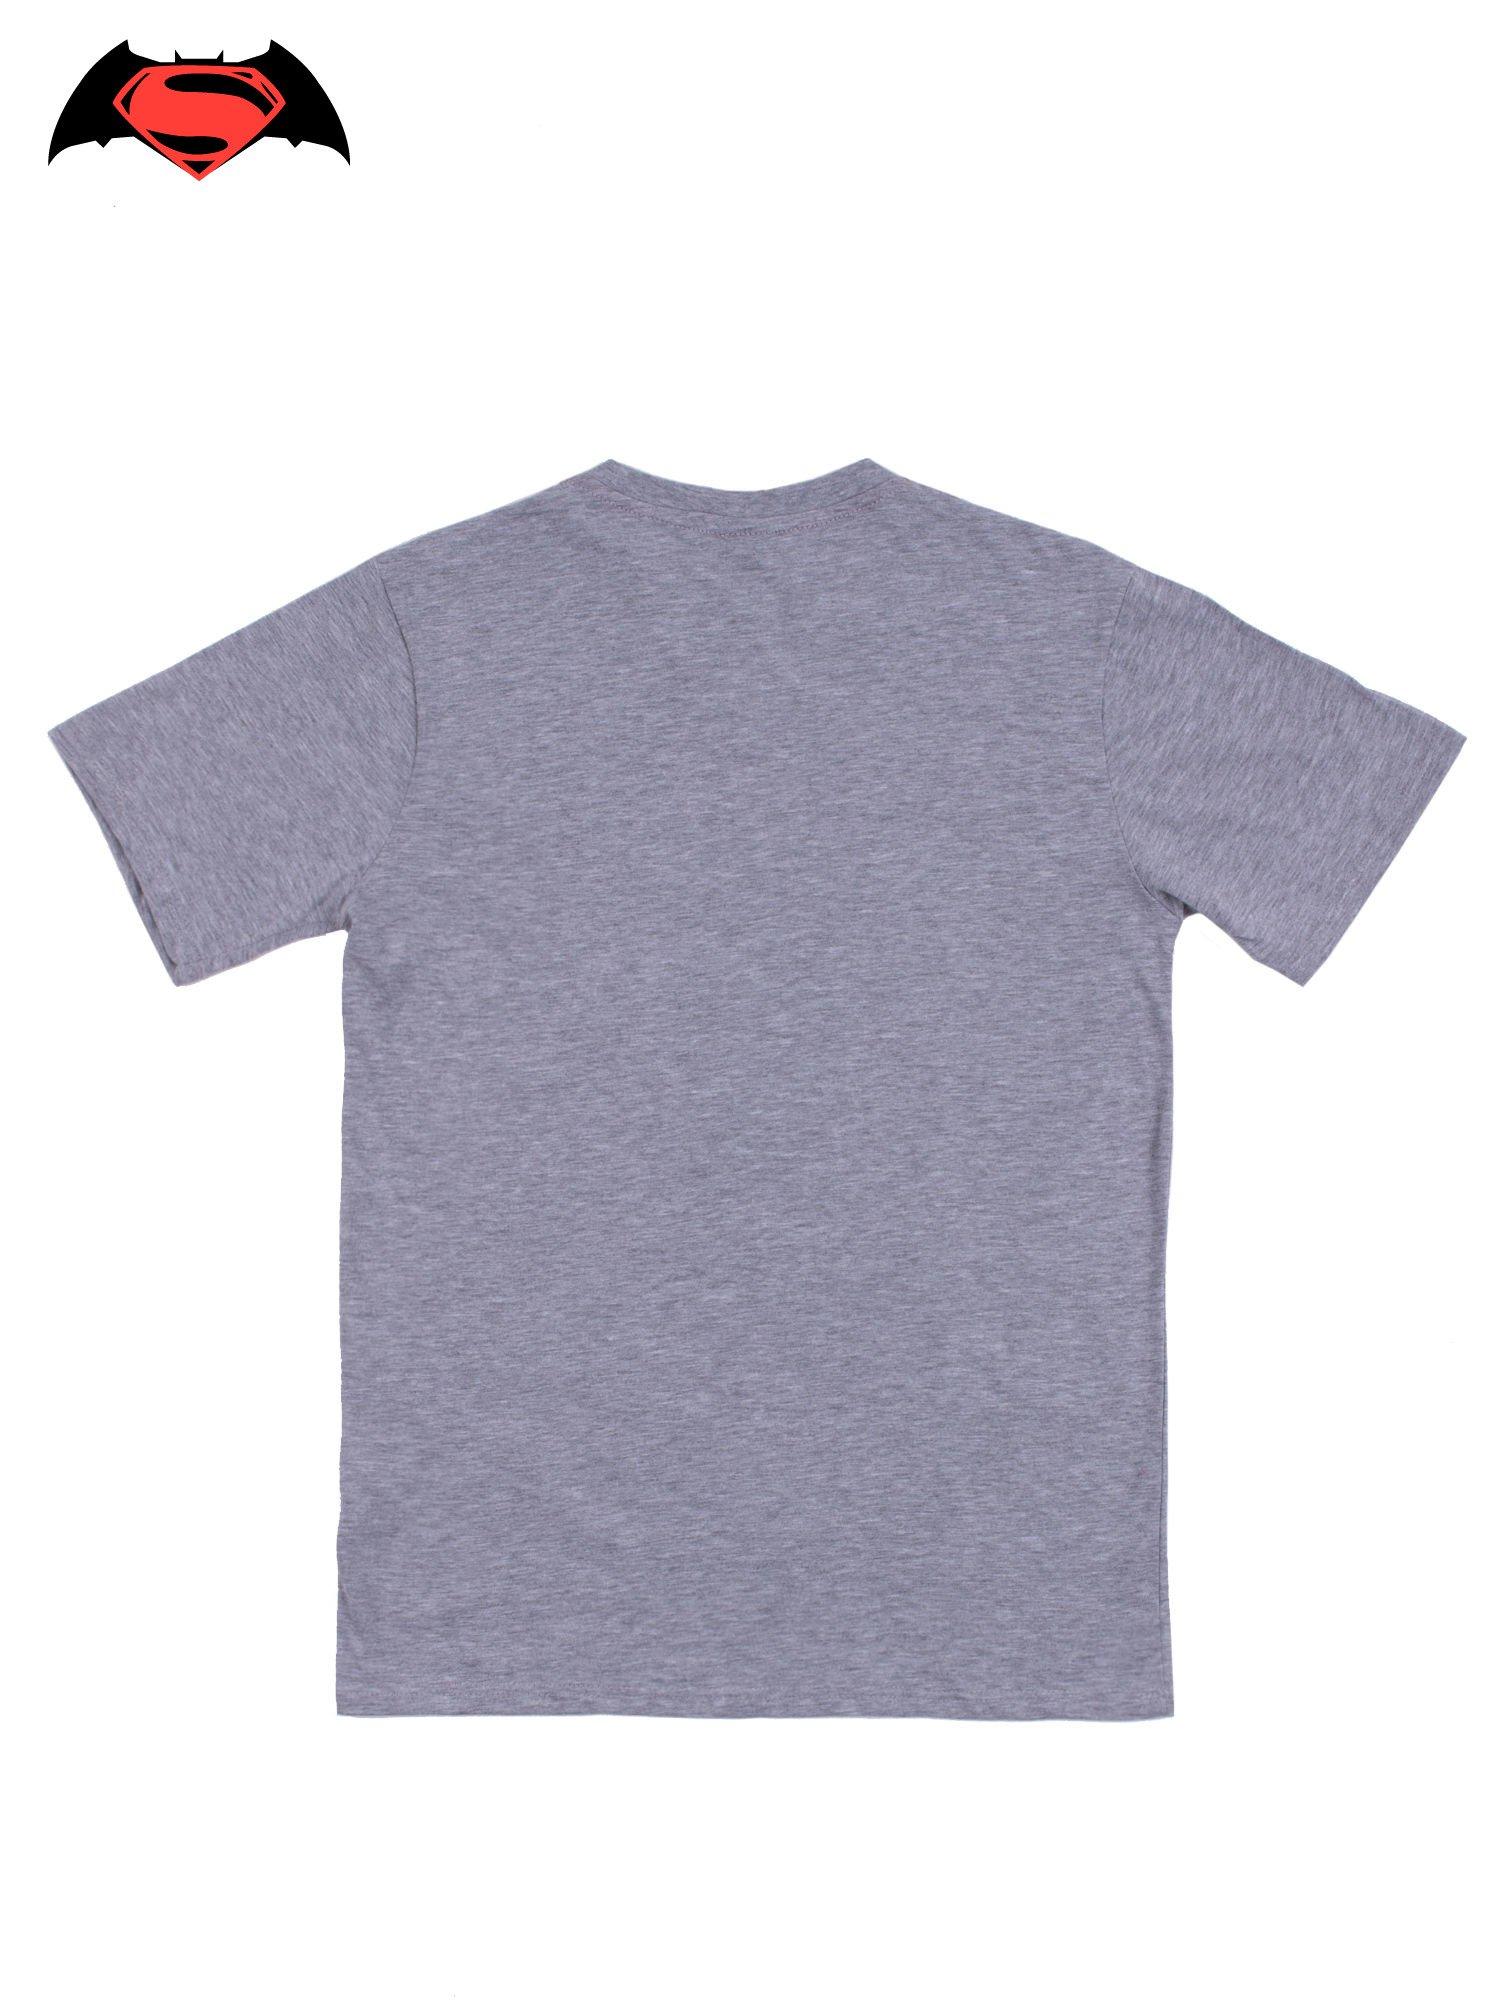 Szary t-shirt męski z nadrukiem BATMAN V SUPERMAN                                  zdj.                                  10